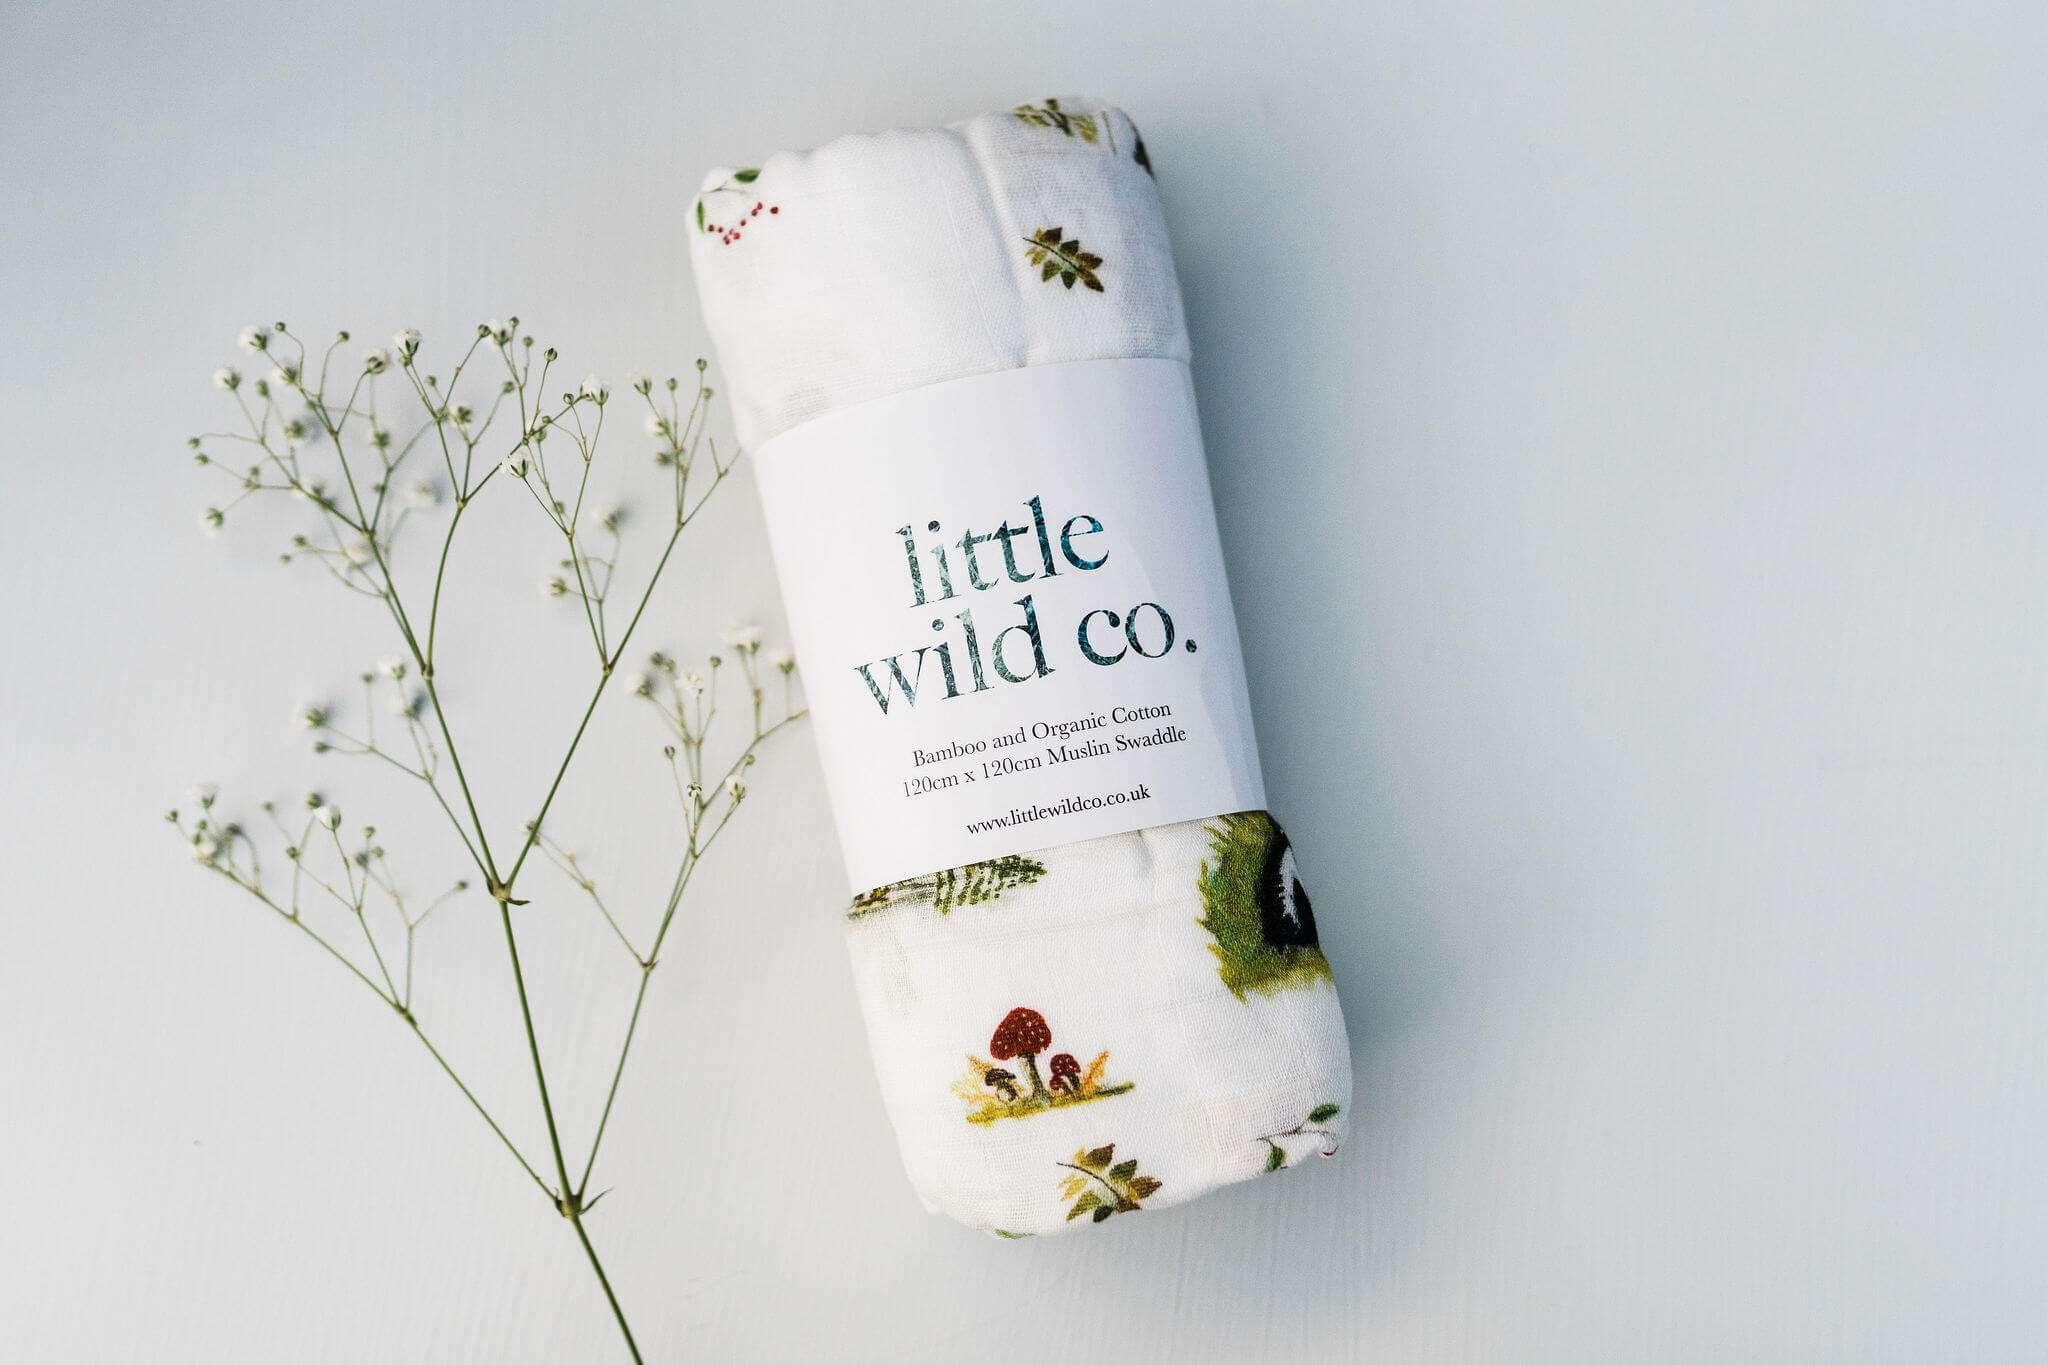 woodland friends packaging